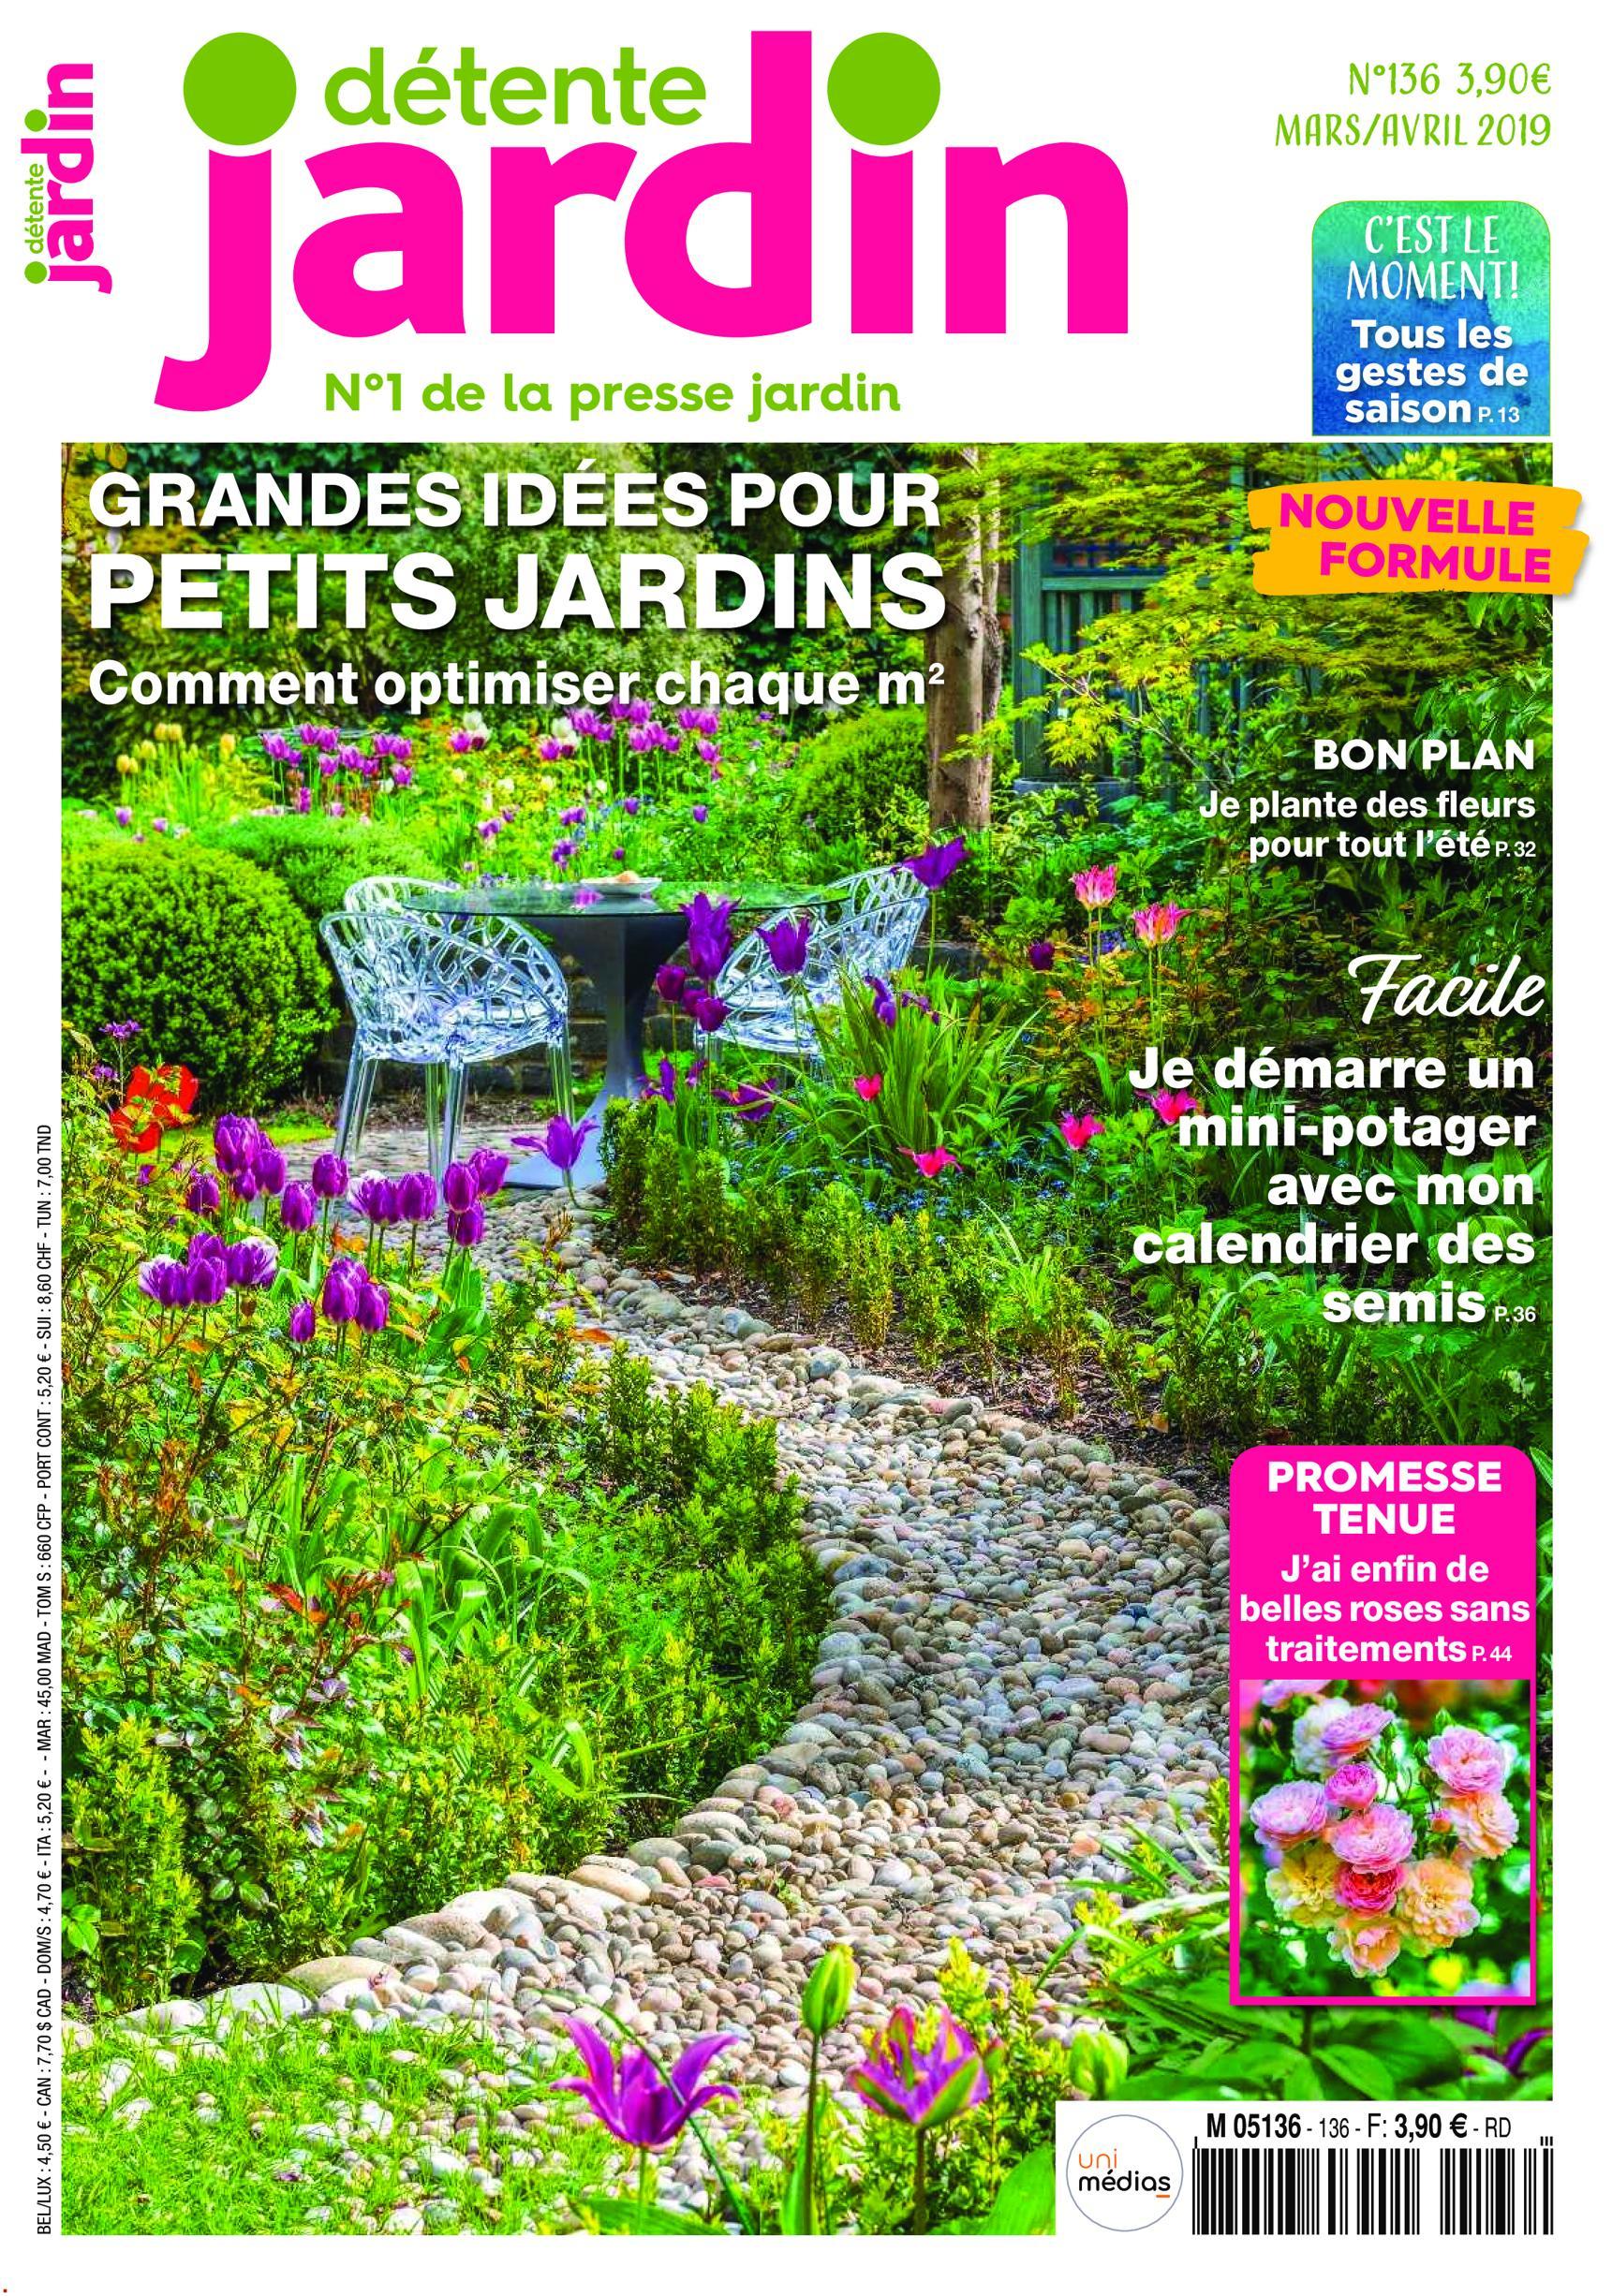 Détente Jardin - Mars/avril 2019 » Free Pdf Magazines For ... destiné Detente Jardin